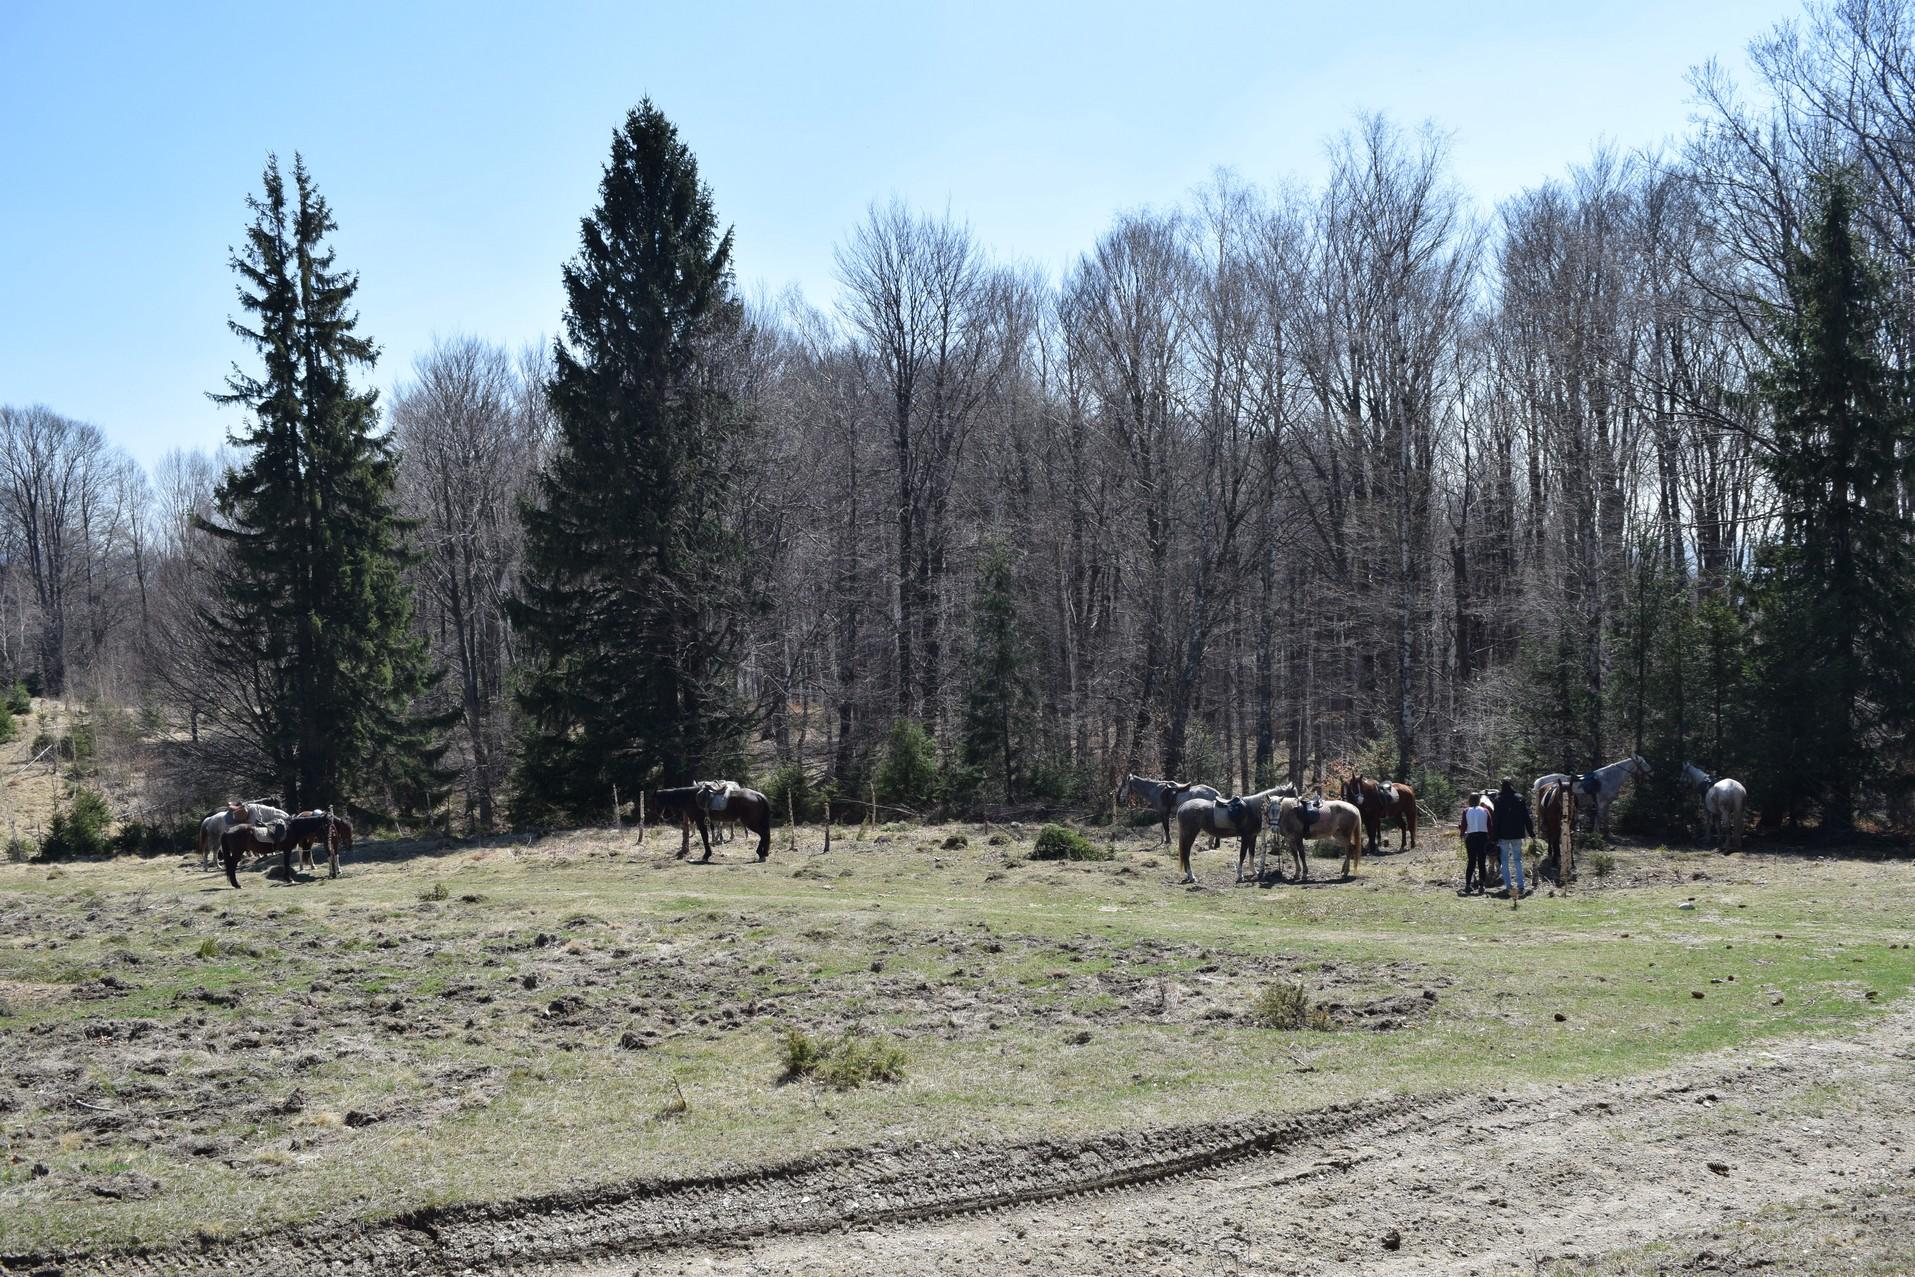 randonnee equestre